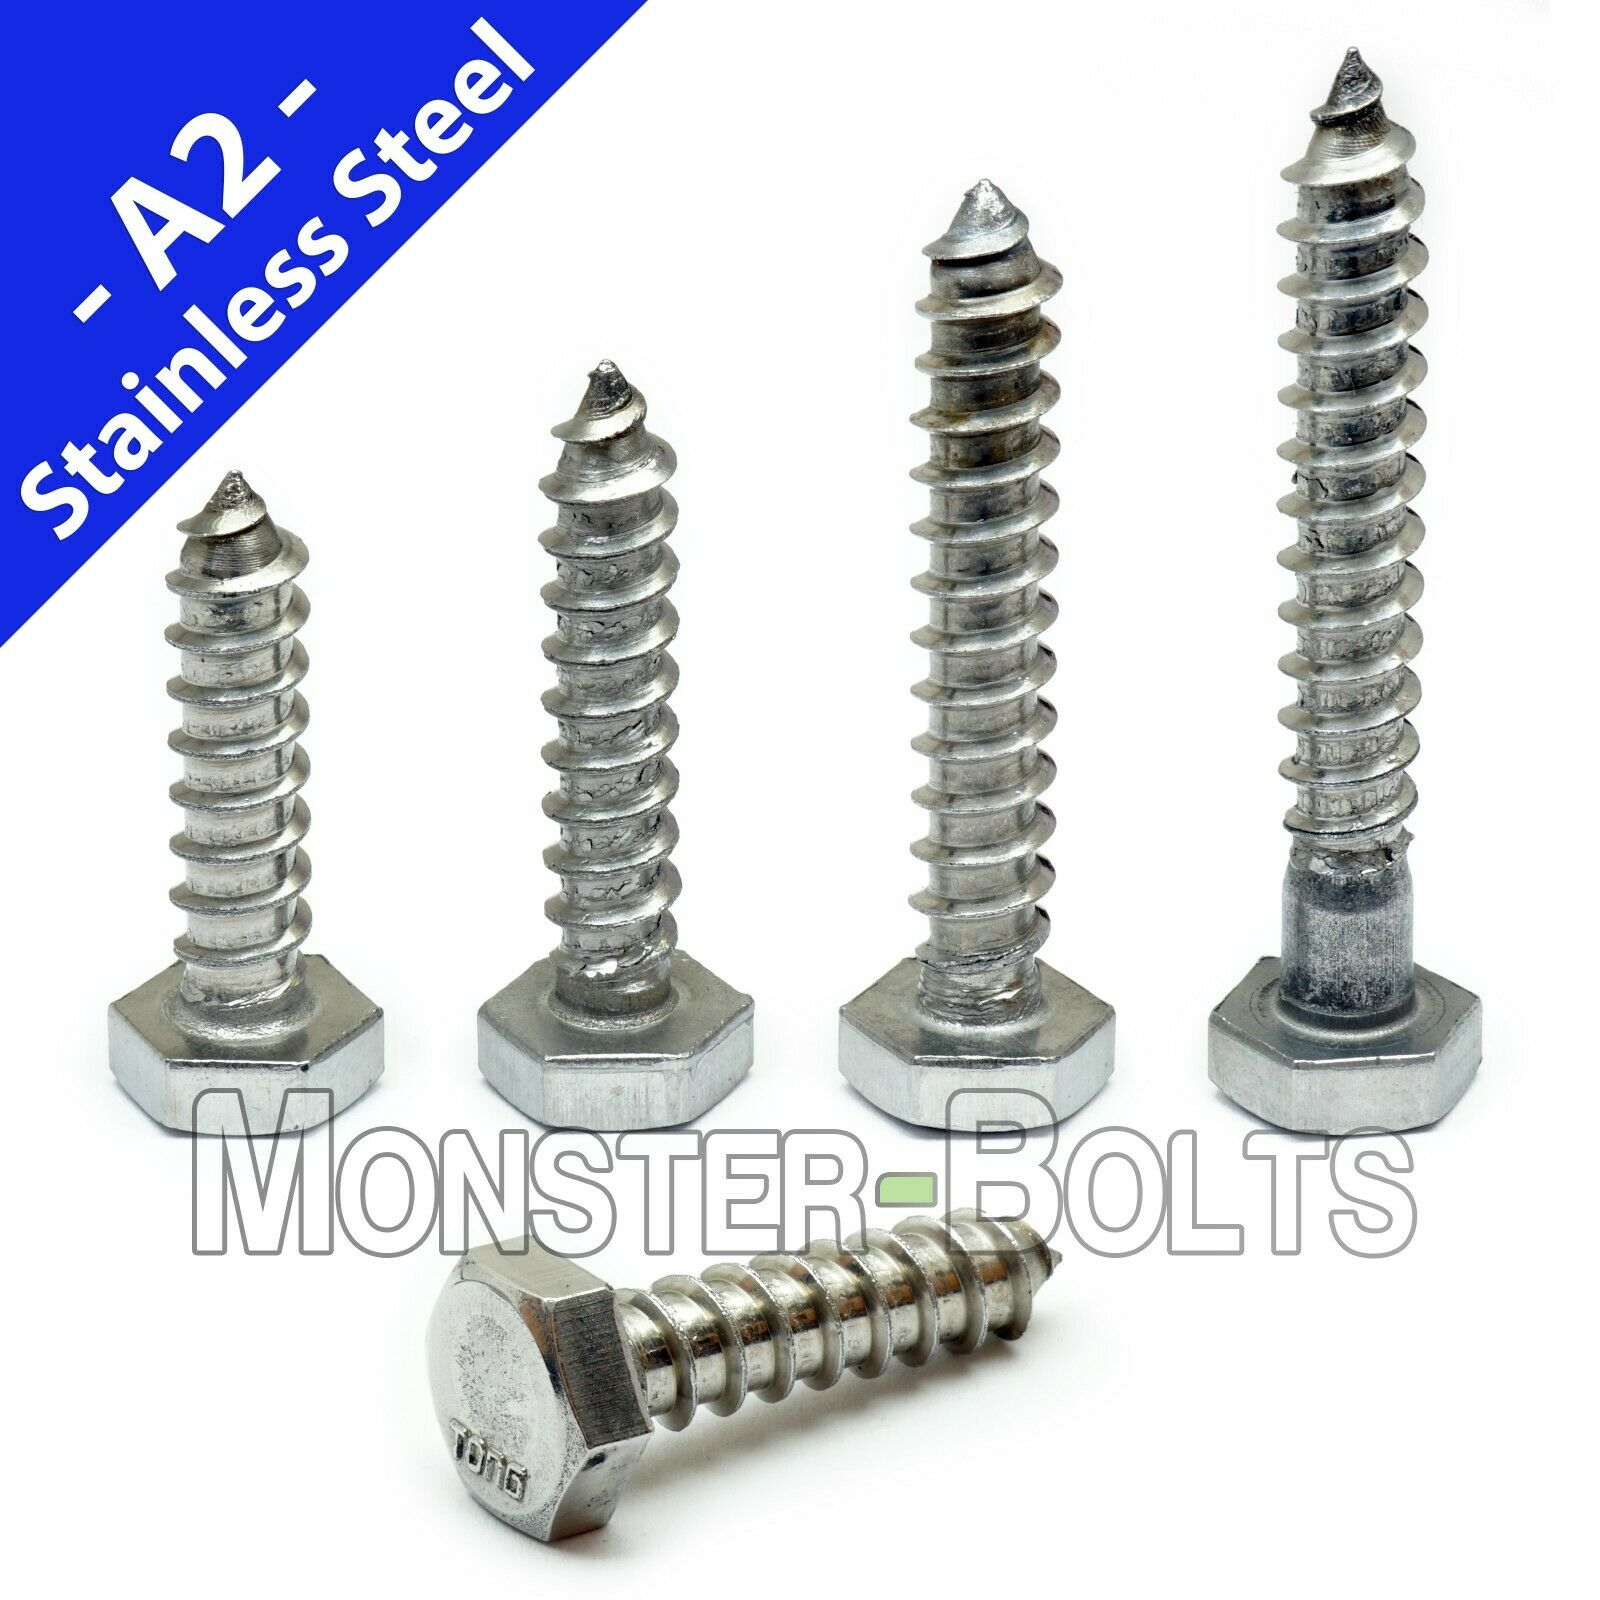 1//2 X 7 125 pcs Steel Hot Dip Galvanized Hex Head Lag Screw Bolts